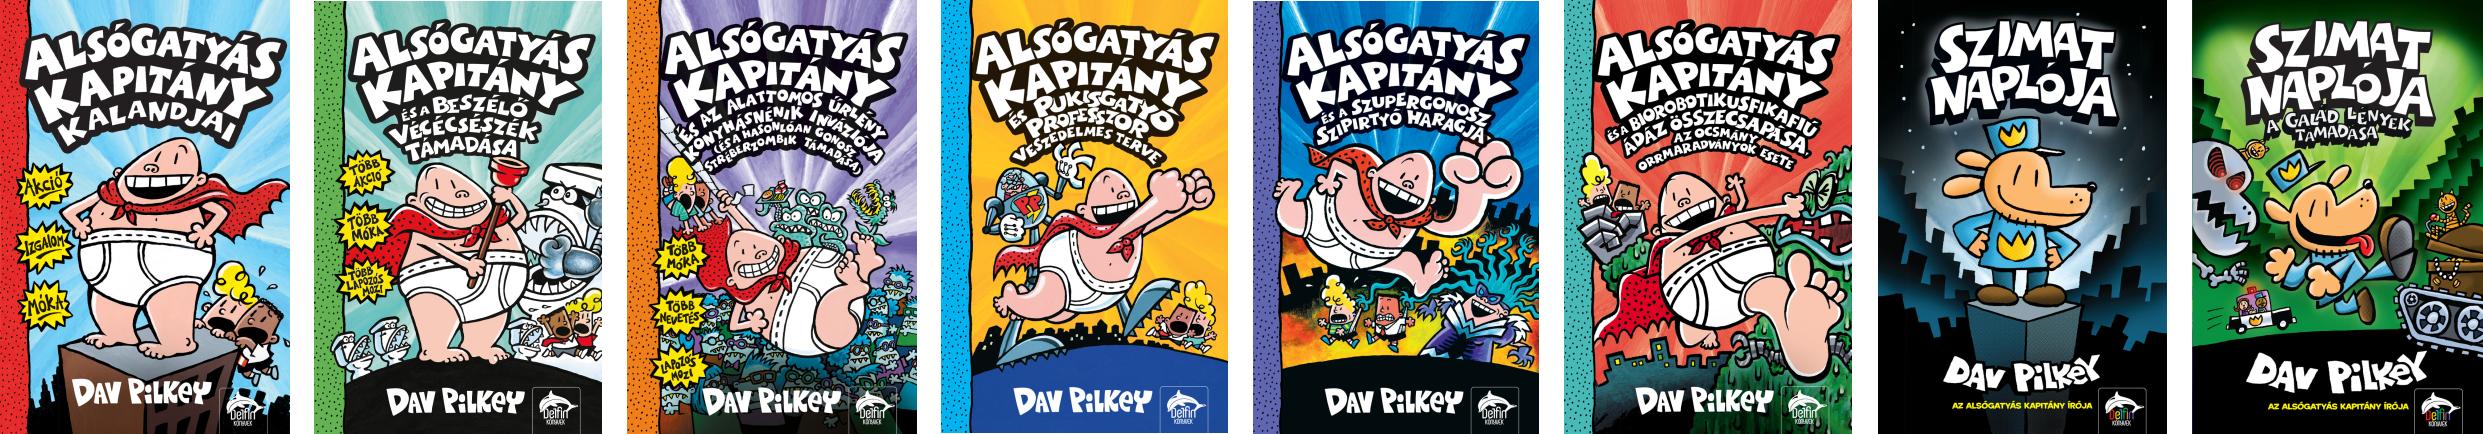 dav_pilkey_books